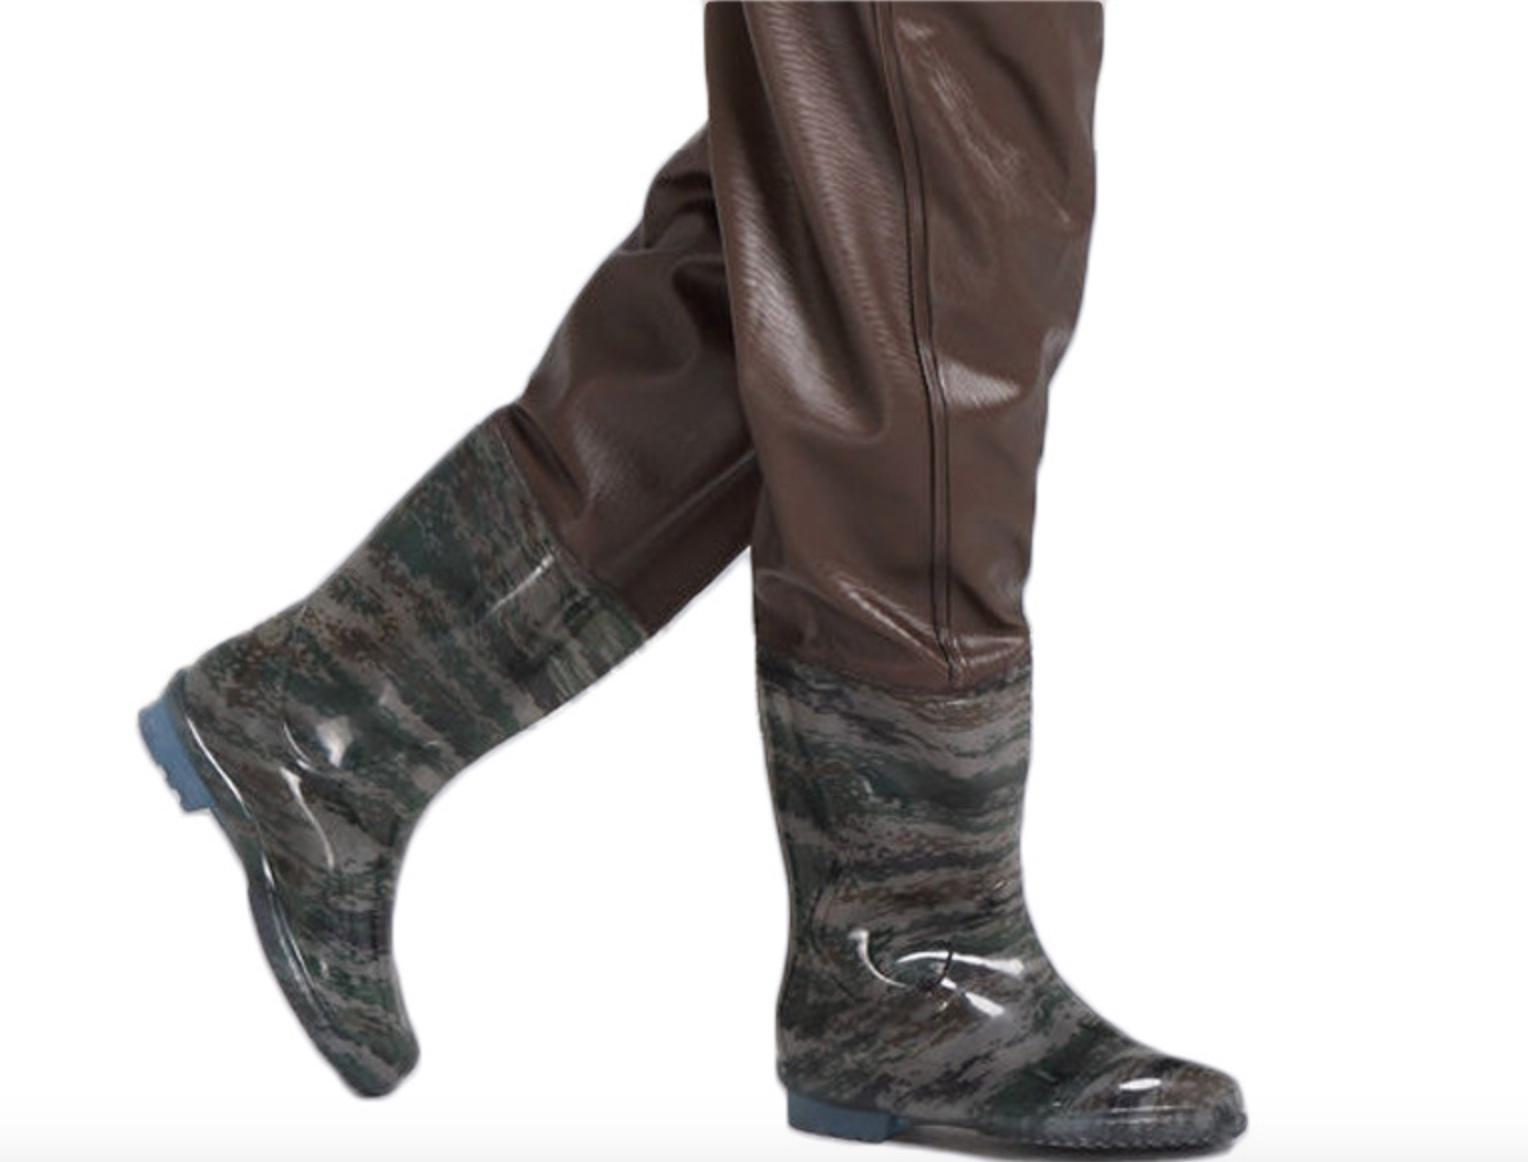 Bib Men Bibs Trouser Rain Pants Fishing About Pant Waterproof Colors Details 5 Women tCxrhQds